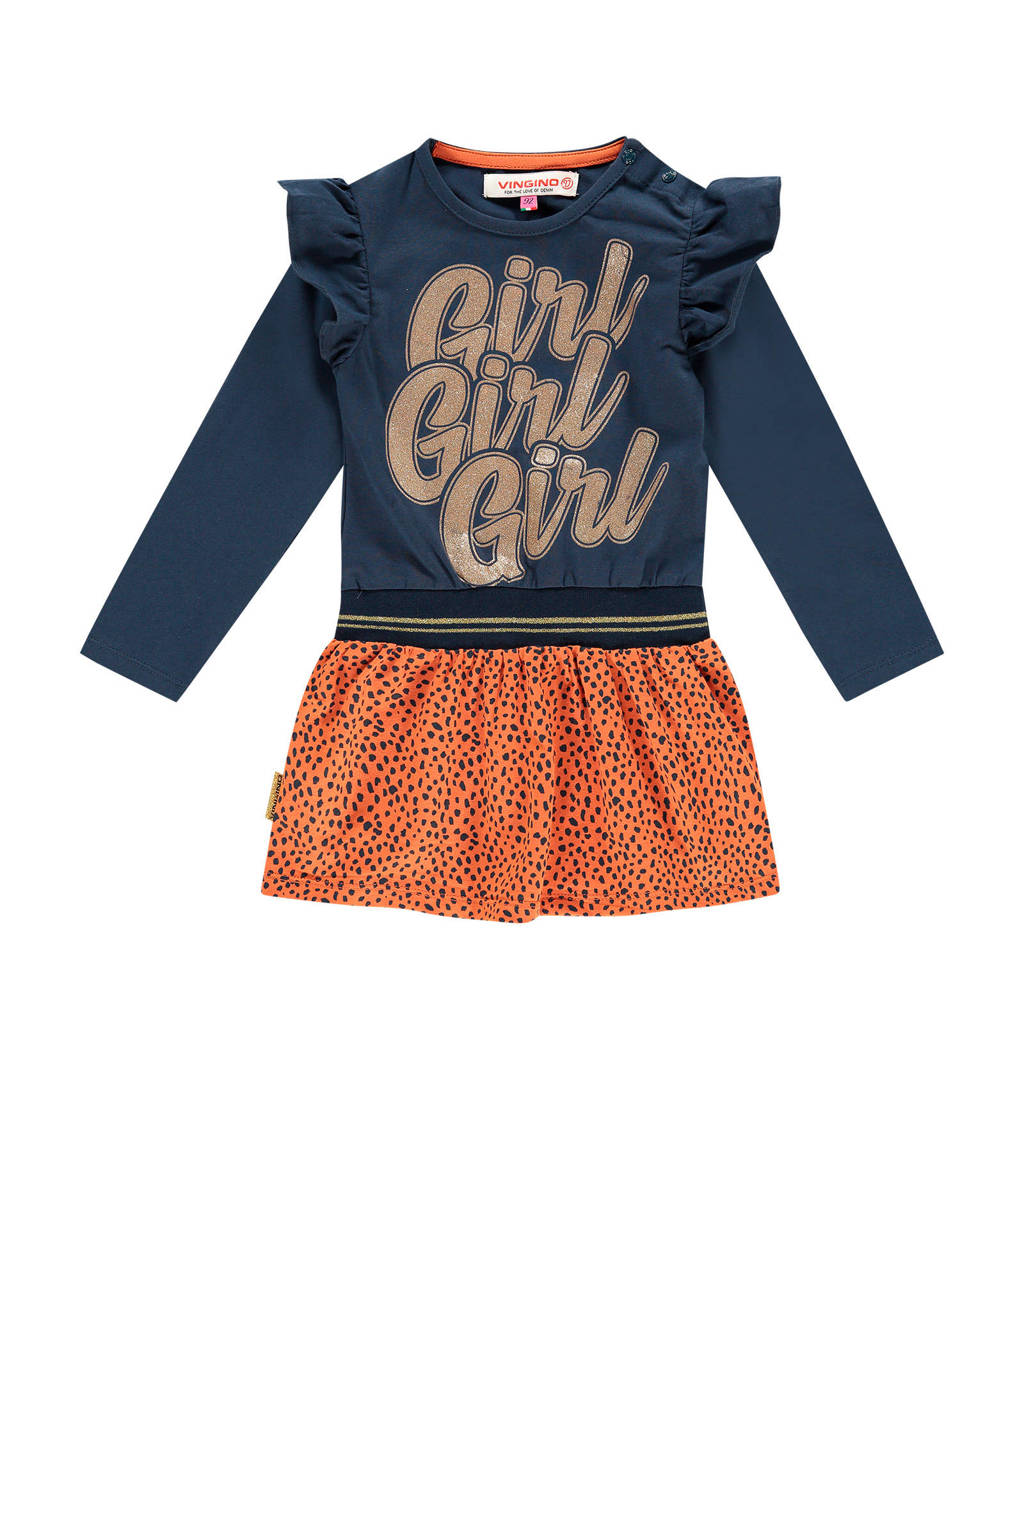 Vingino jurk Ploy mini met tekst en glitters roestbruin/donkerblauw, Roestbruin/donkerblauw